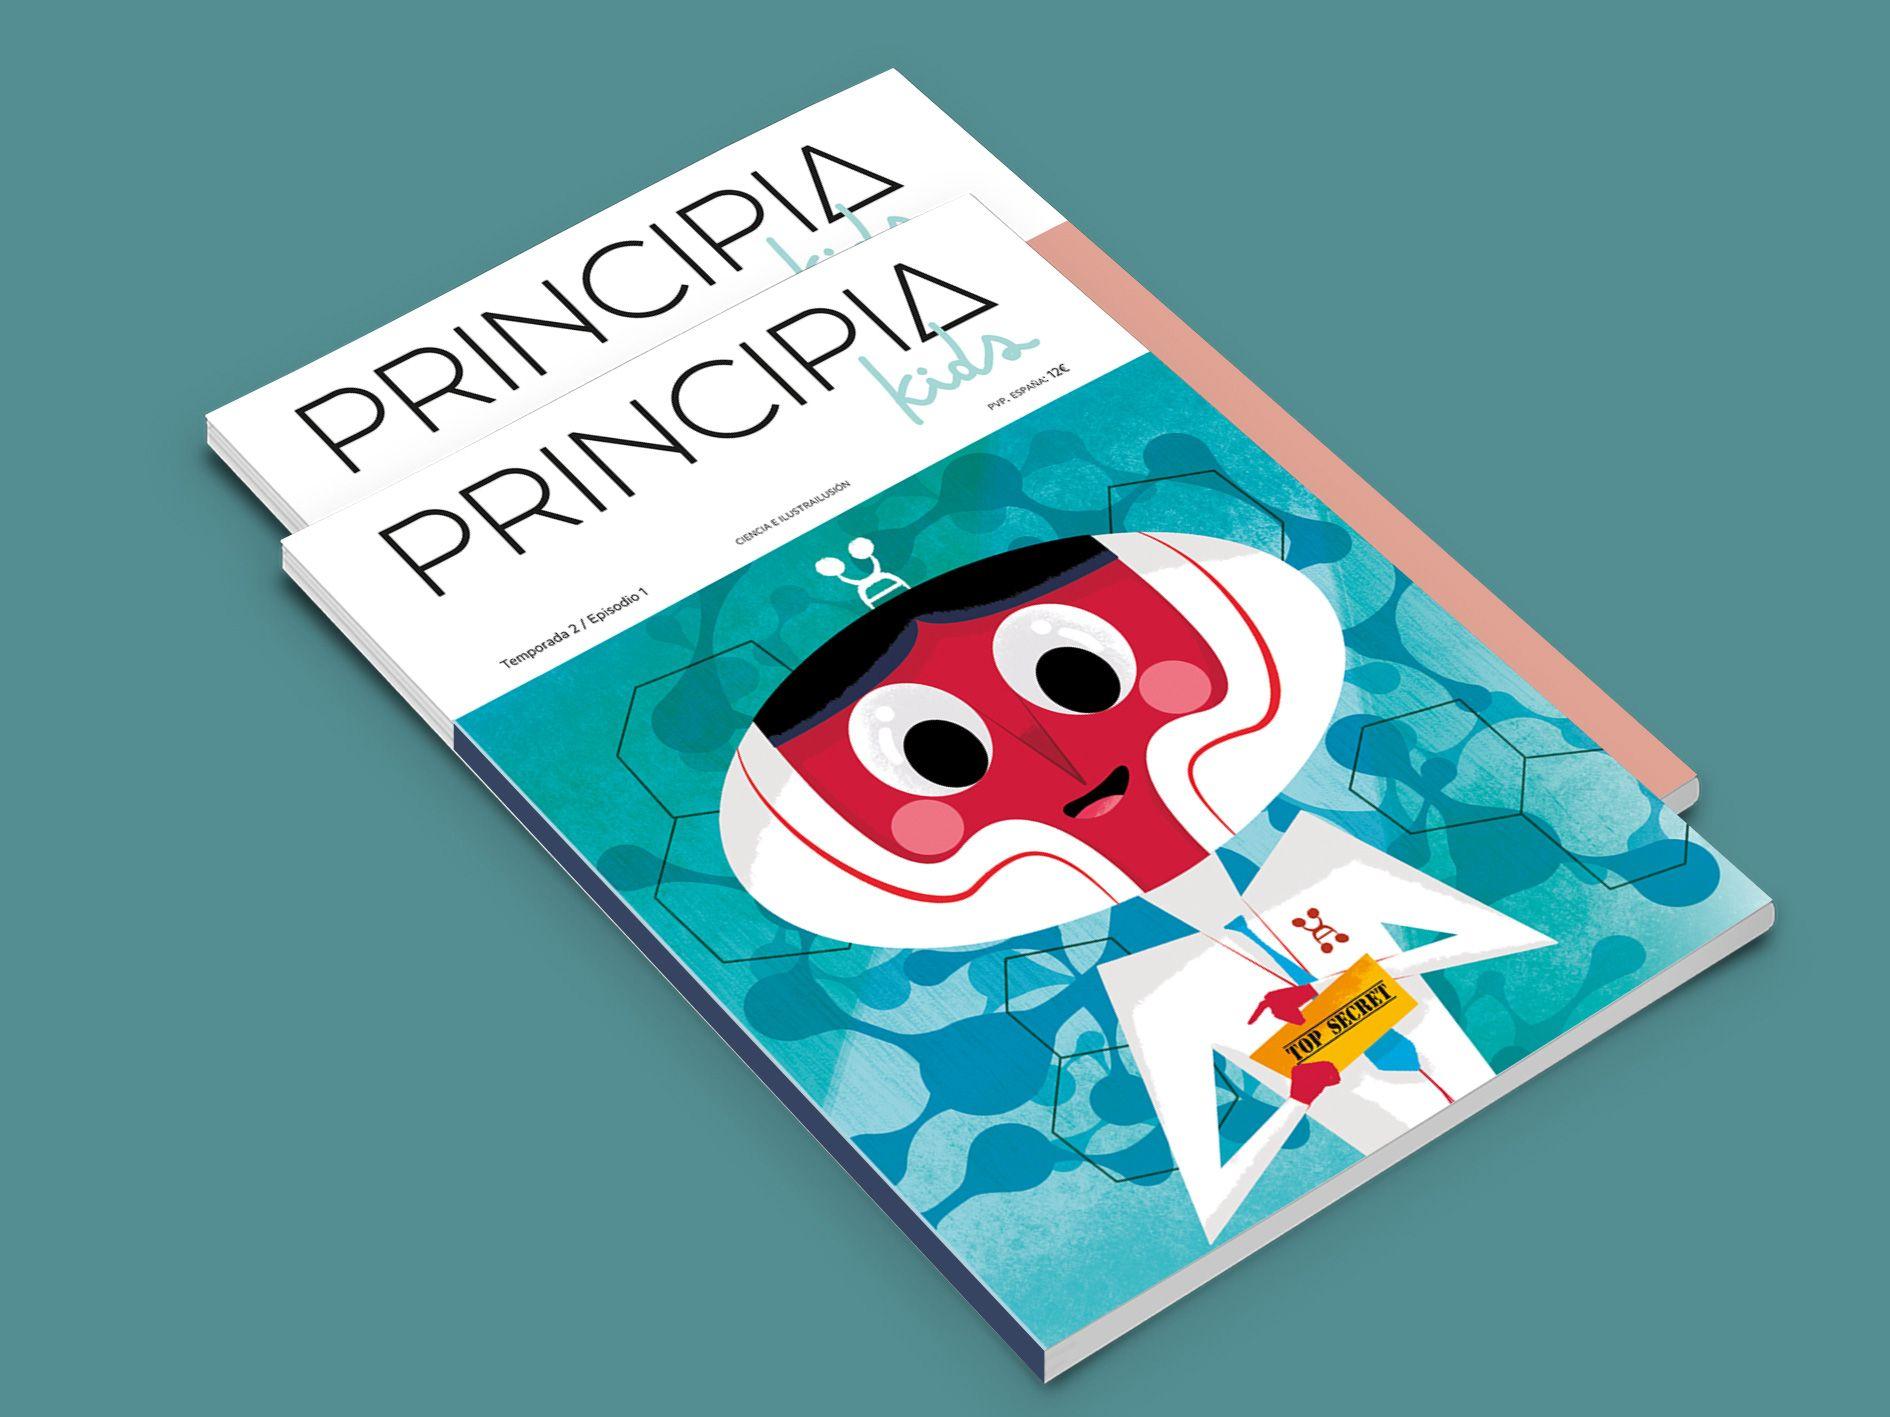 shop.PRINCIPIA